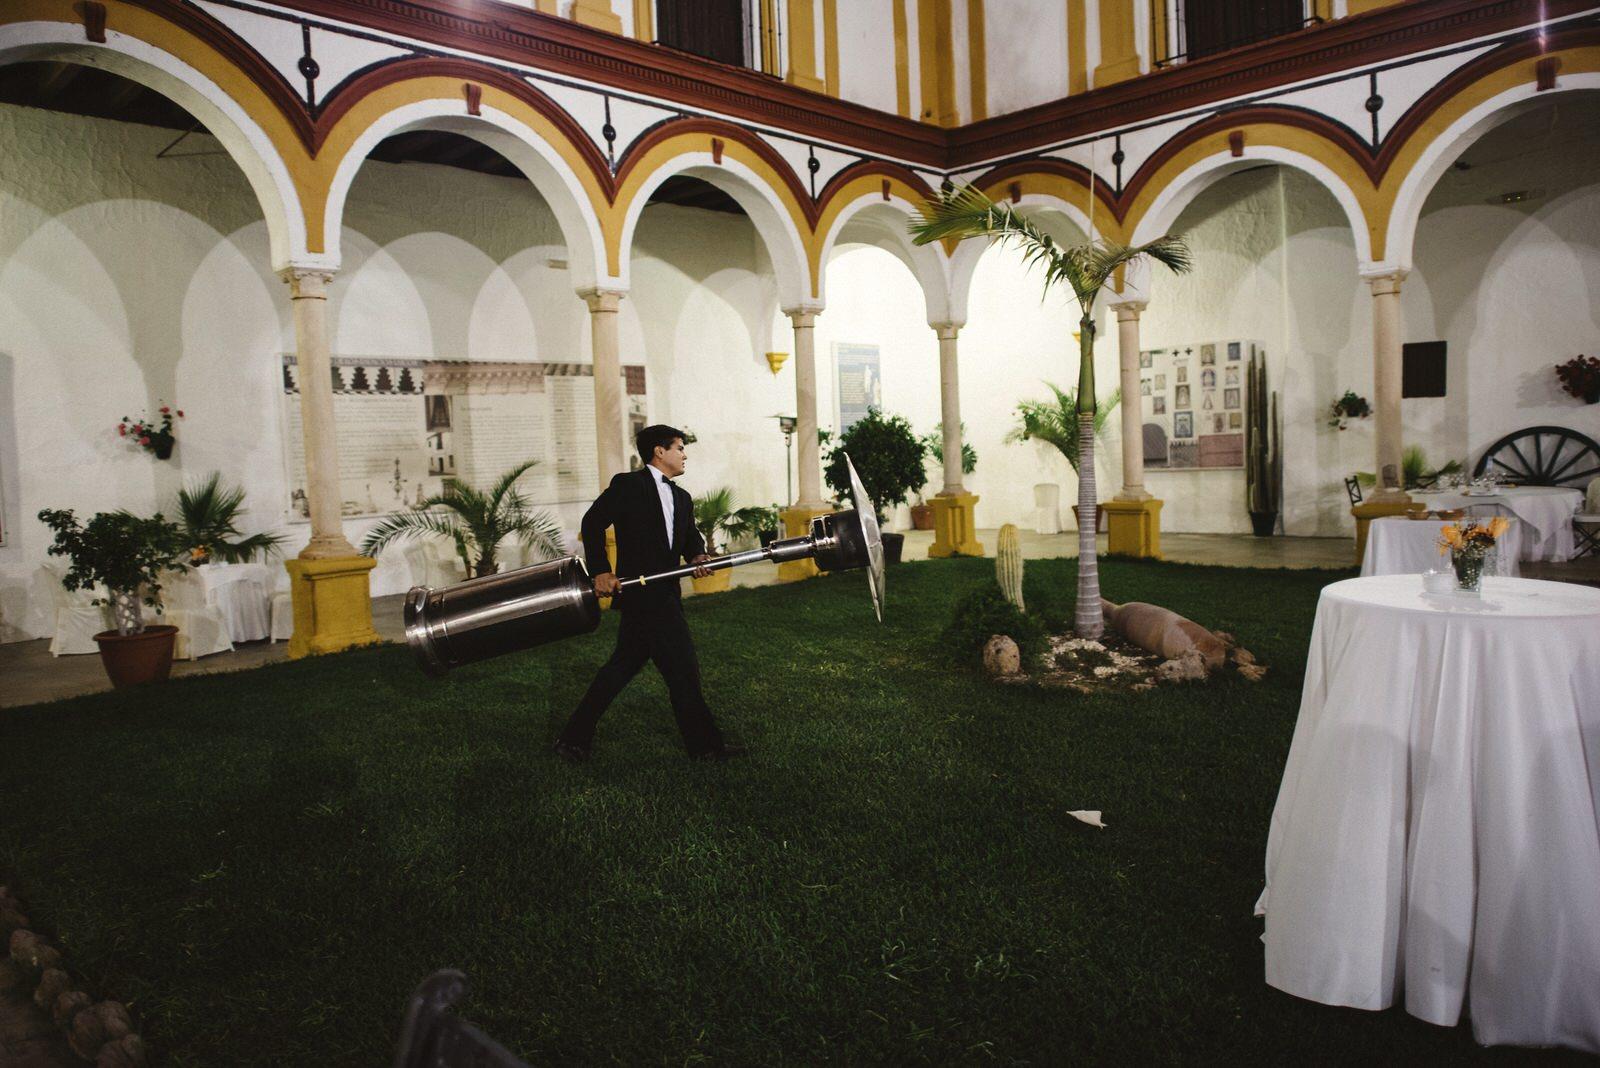 fotografo de bodas sevilla - fotografo boda - fotografía sevilla - Andrés AmarilloAAA_3476- fine.JPG